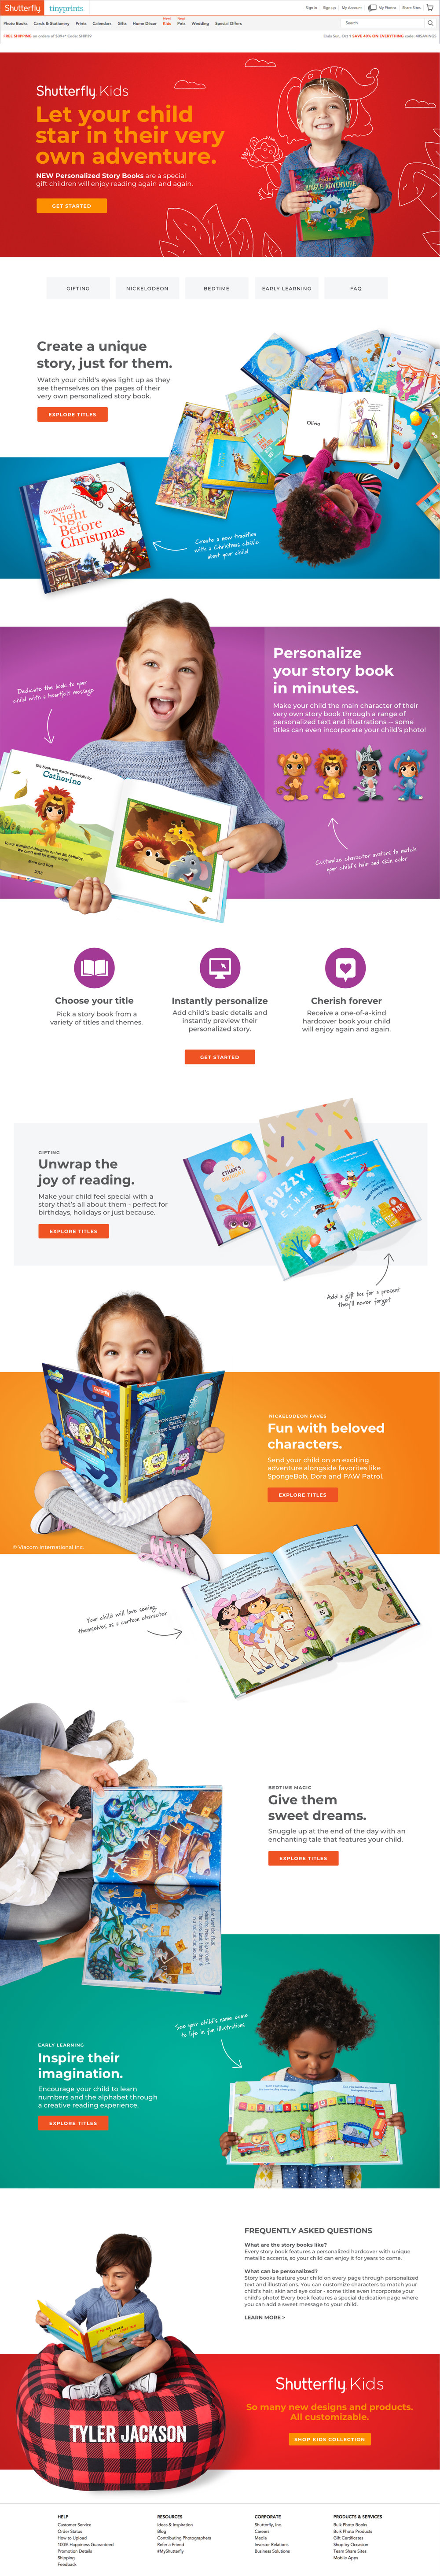 storybooks_R5_desktop_fullpage@1600.jpg